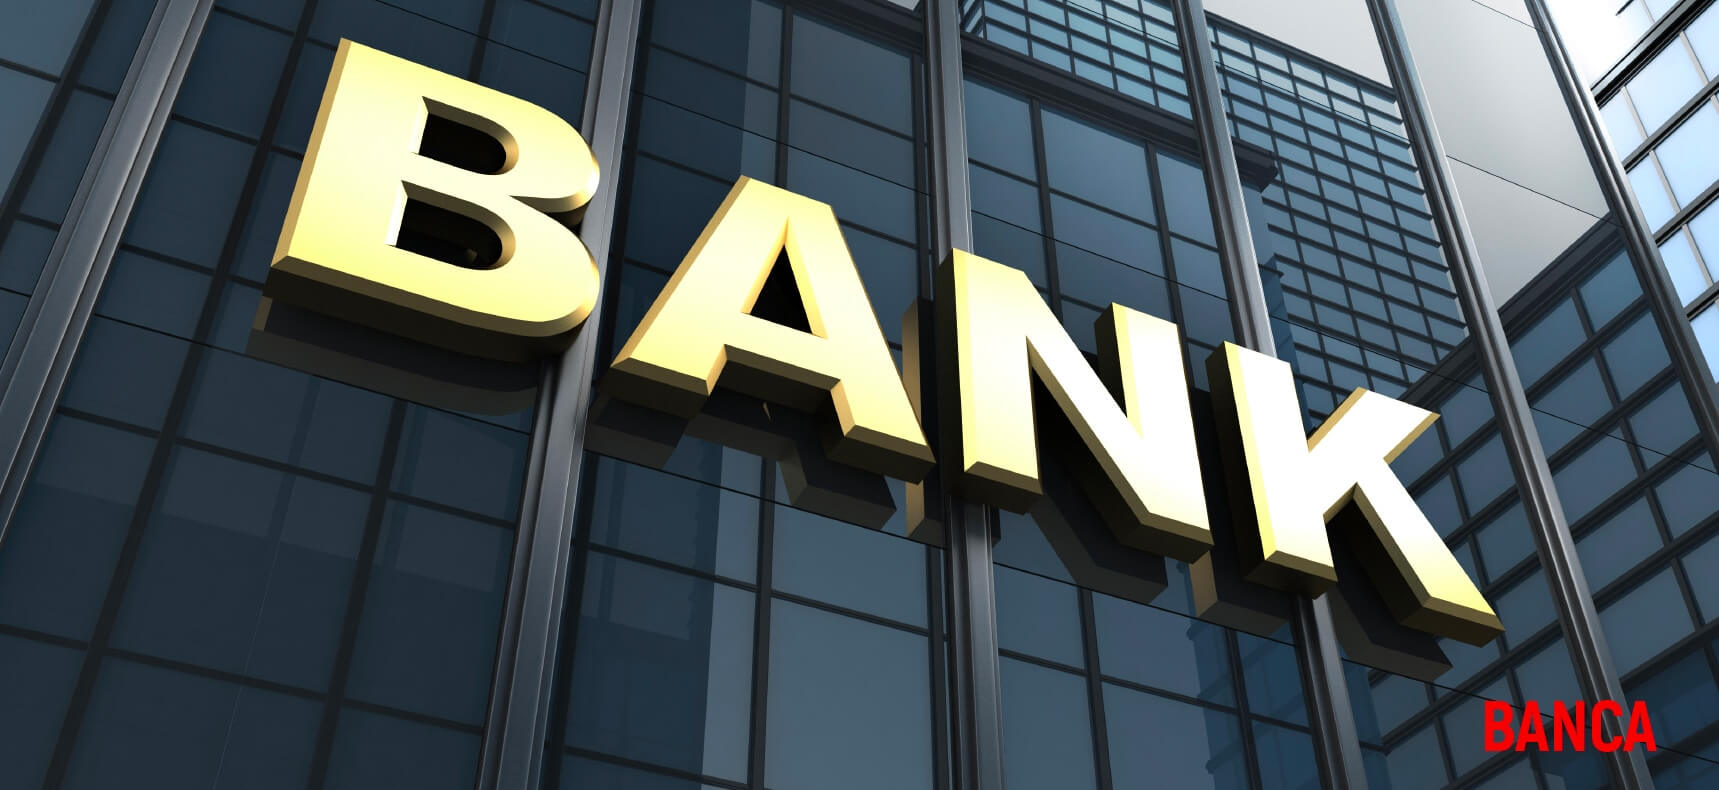 Banca in francia